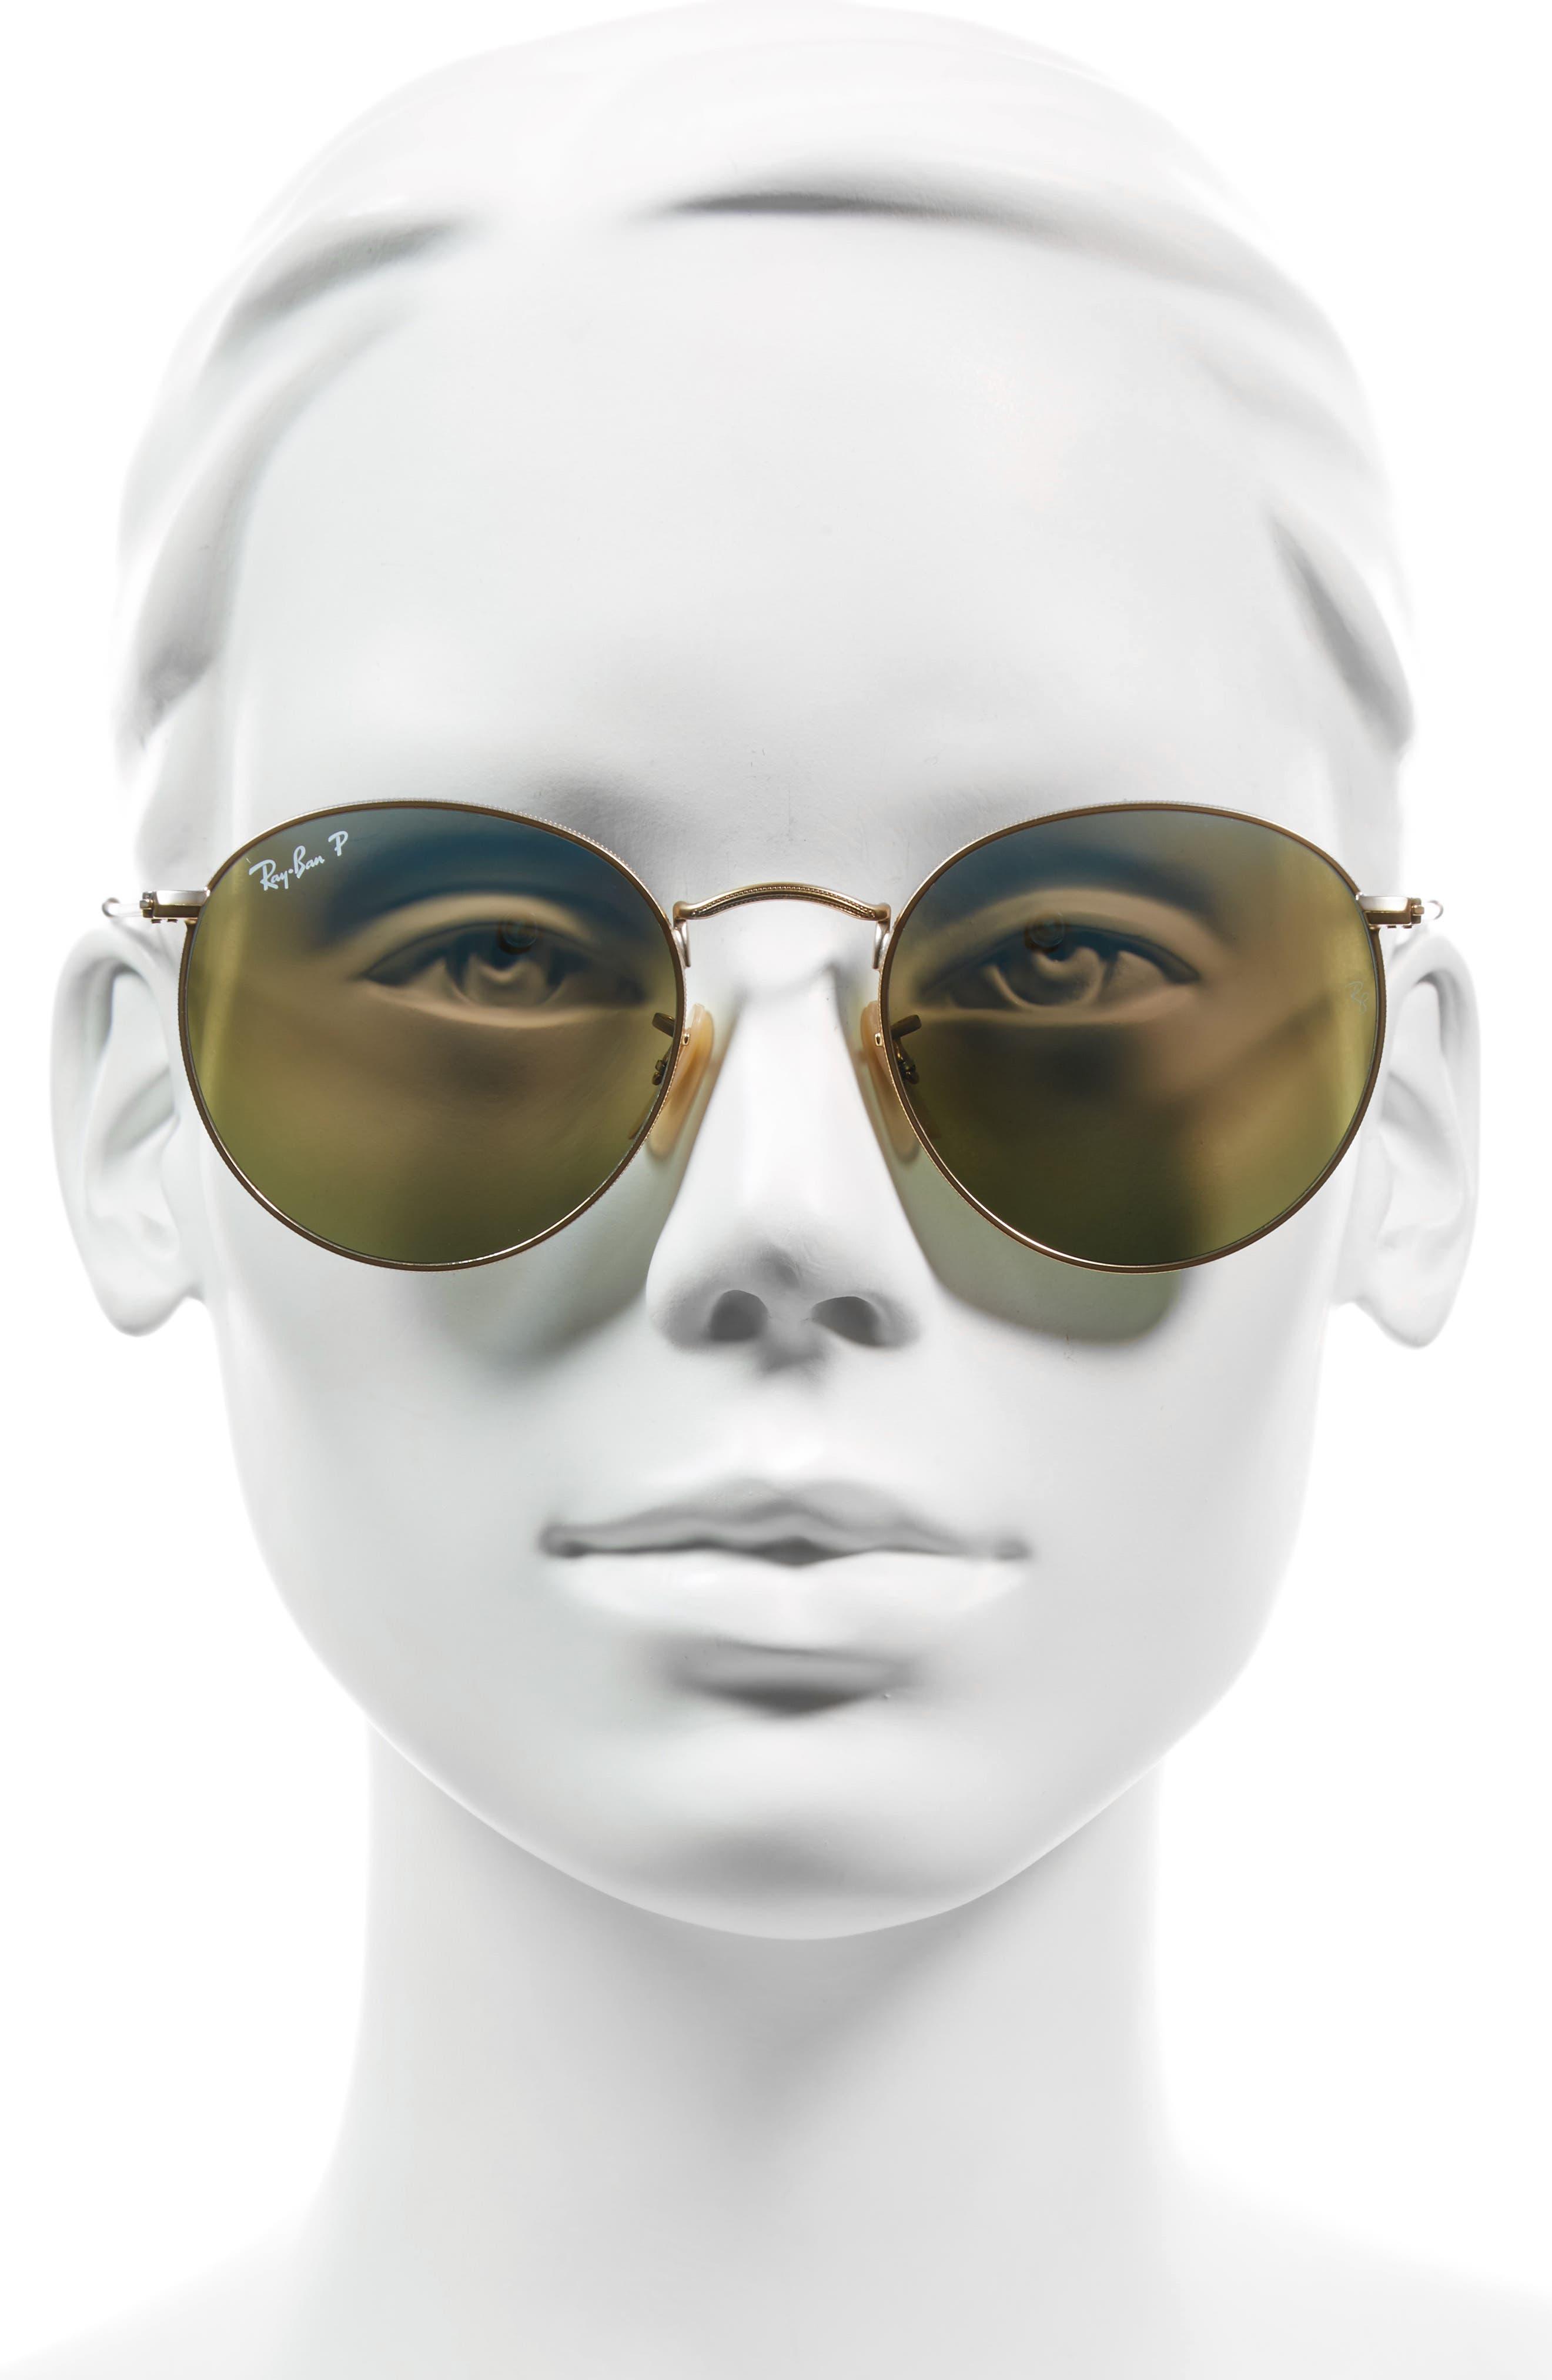 53mm Polarized Round Retro Sunglasses,                             Alternate thumbnail 2, color,                             Blue Mirror